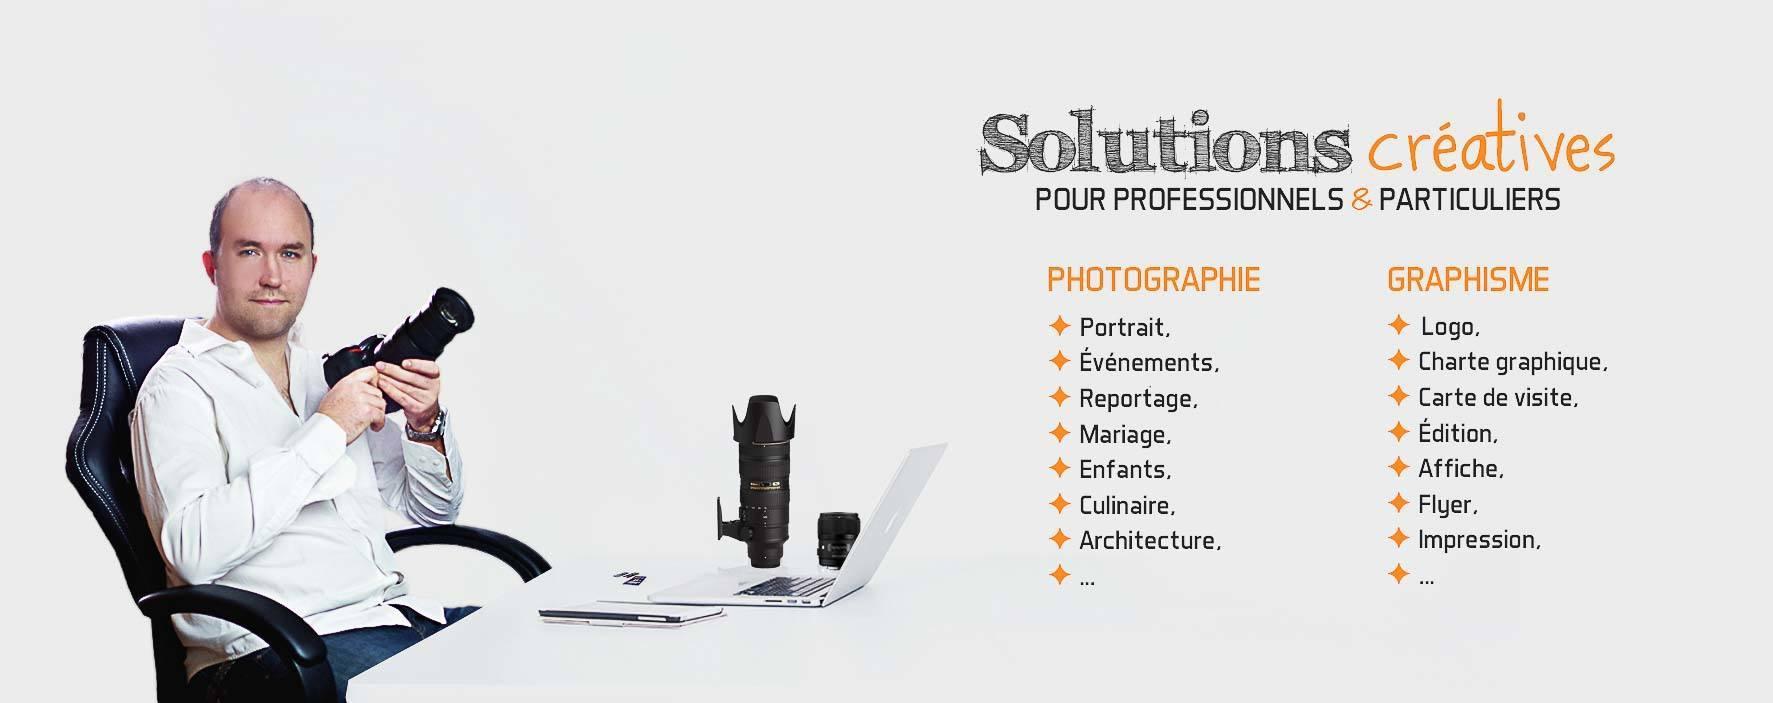 slider presentation photographe avec les prestations